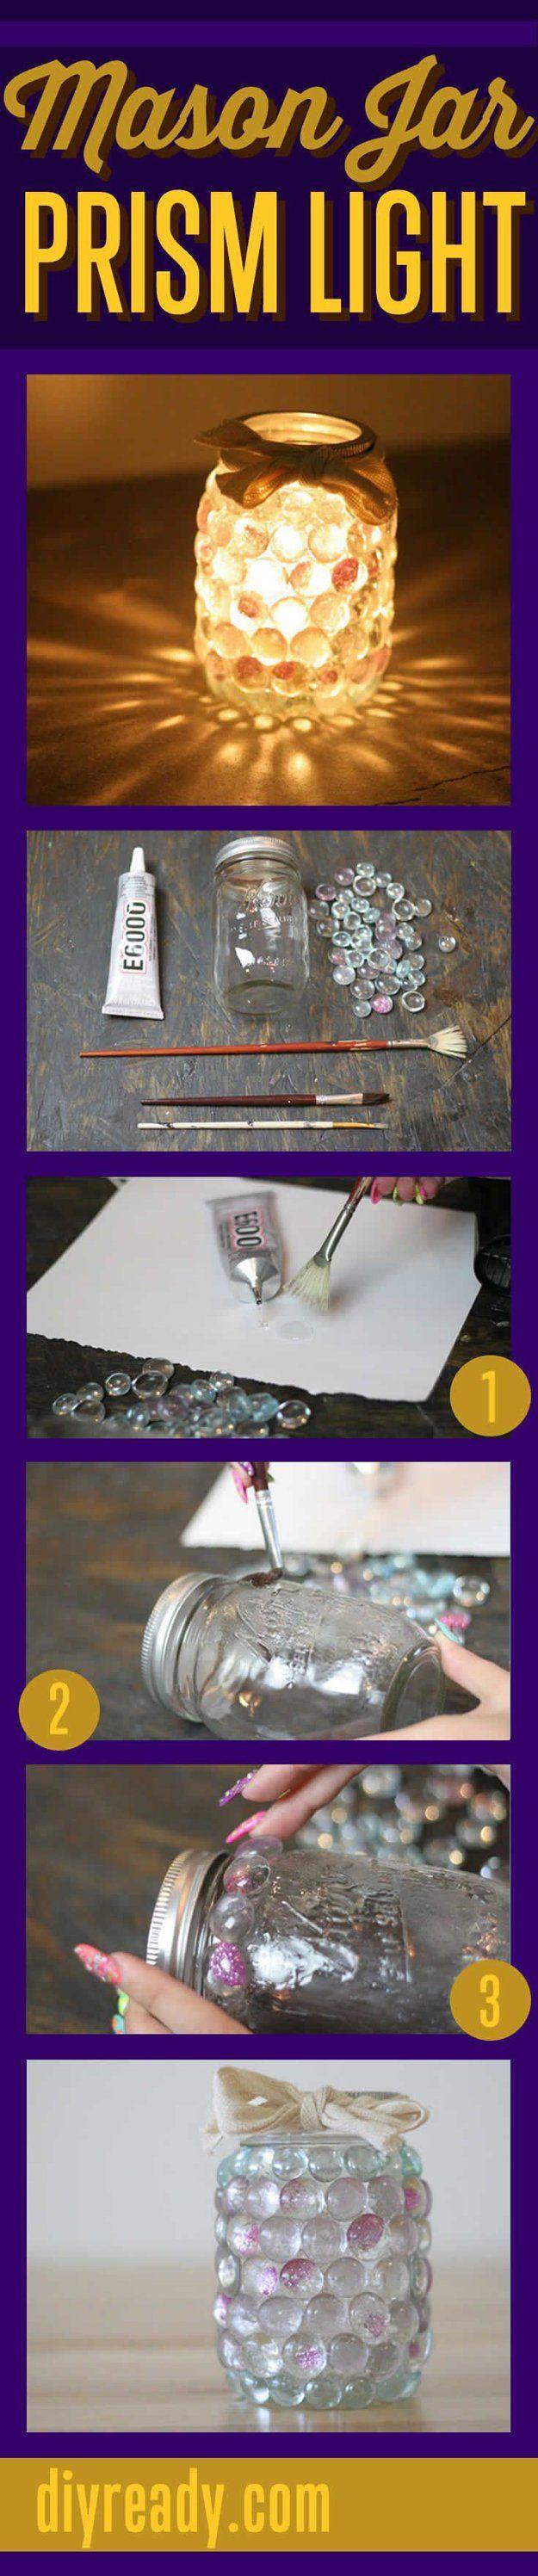 DIY Outdoor Lantern Ideas | Easy Mason Jar Prism Light by DIY Ready at http://diyready.com/21-diy-outdoor-lantern-ideas/